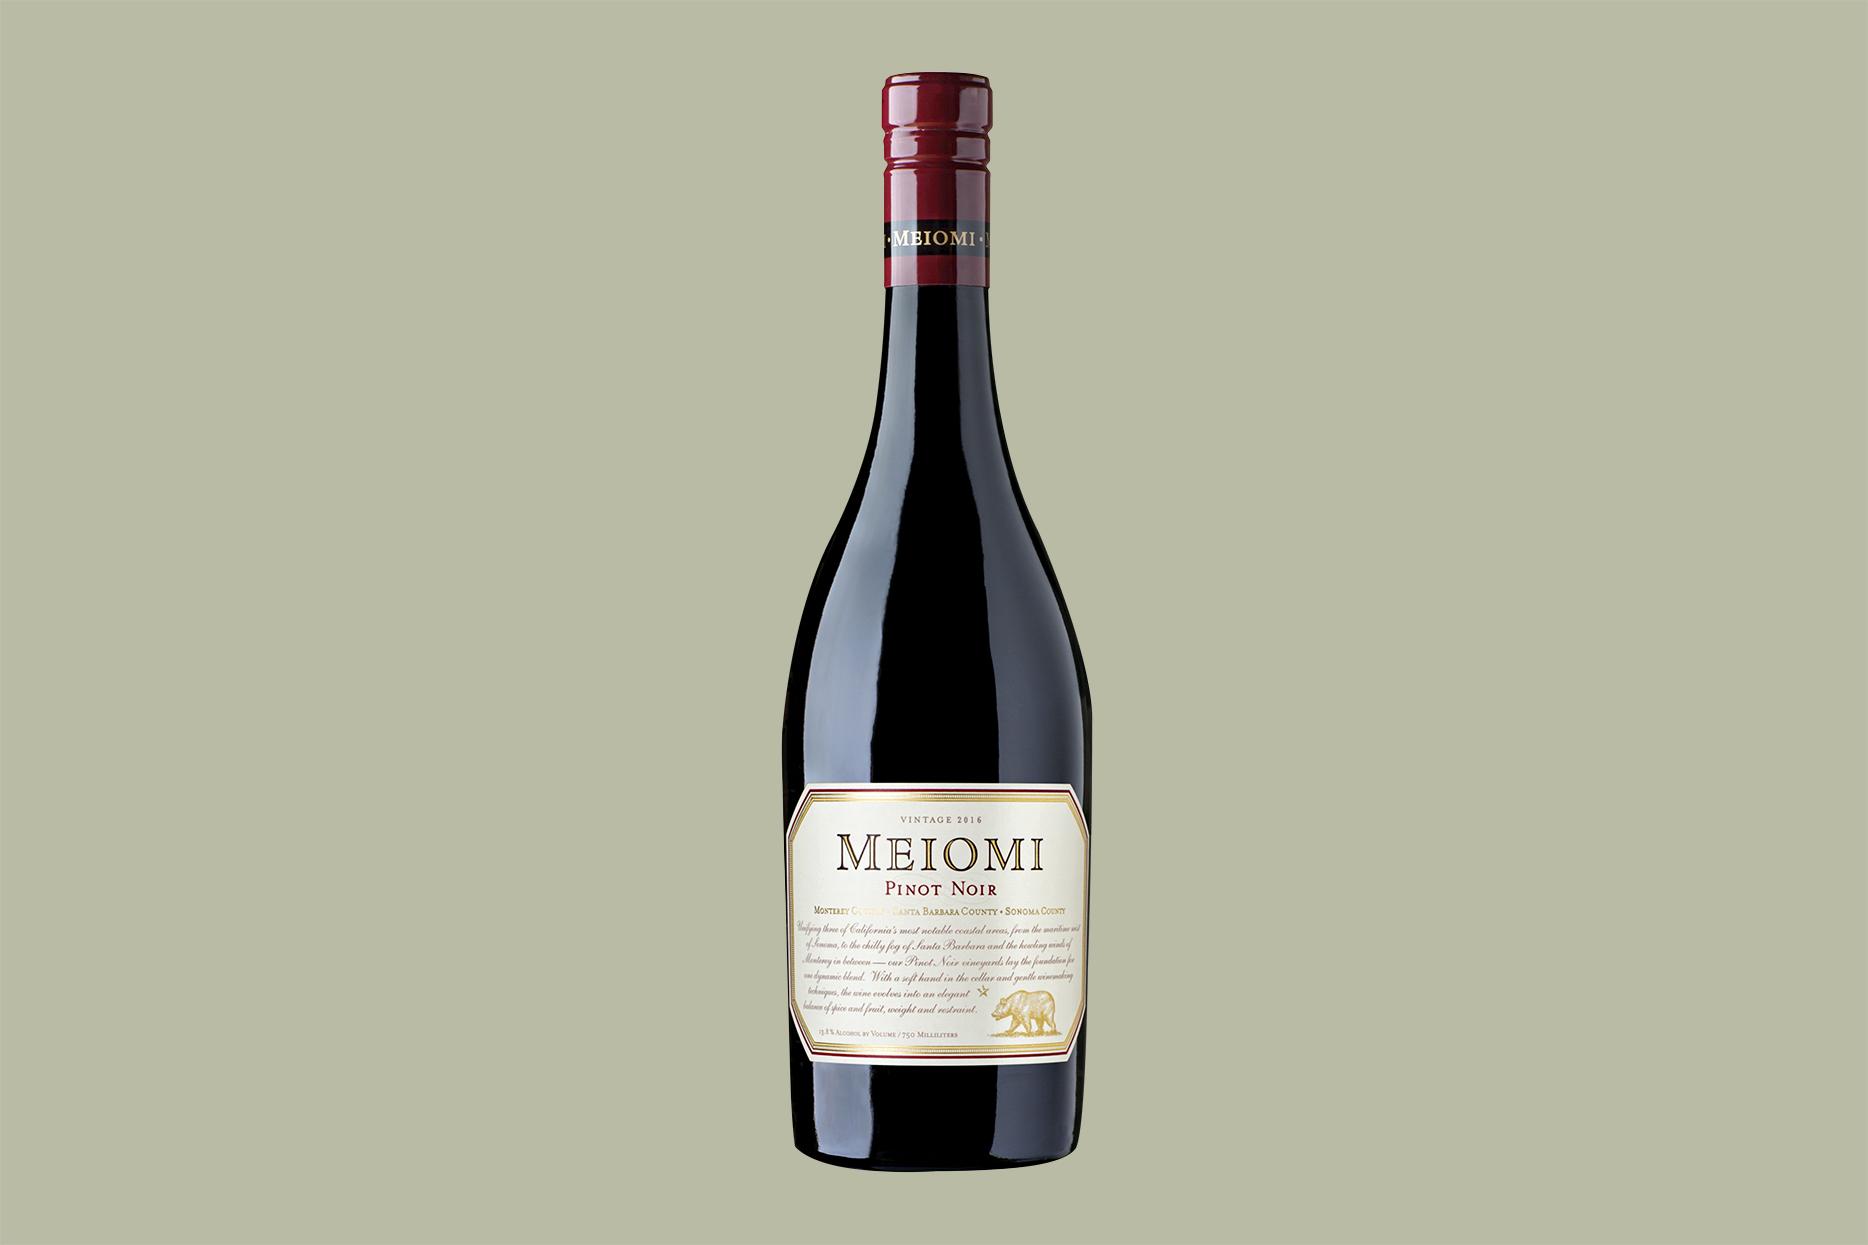 Meiomi Vintage 2016 Pinot Noir